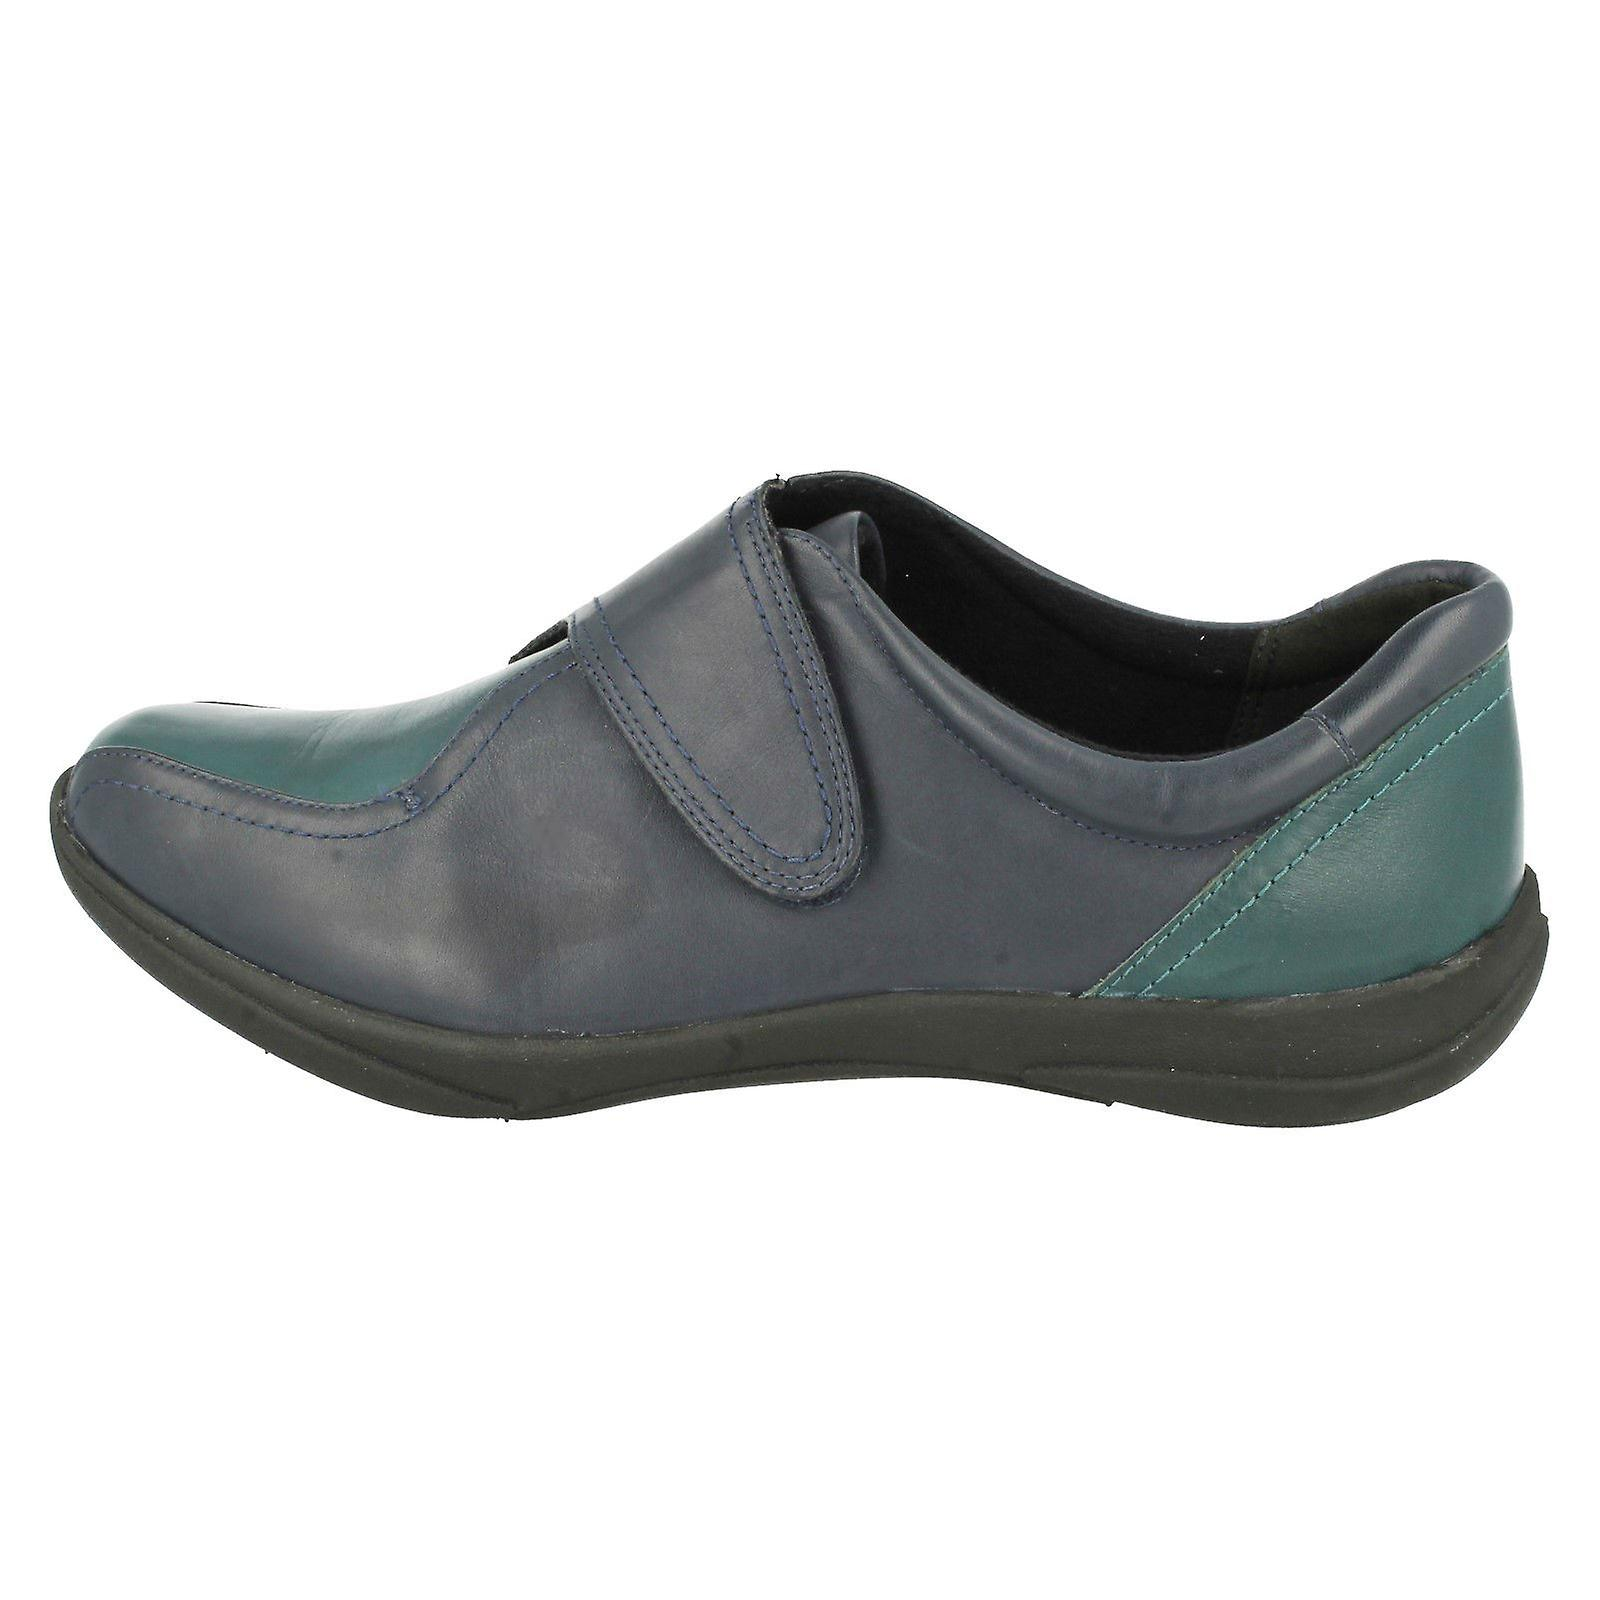 By Etna Oak Ladies Strap Shoes Clarks K's Fastening ZAqHA8